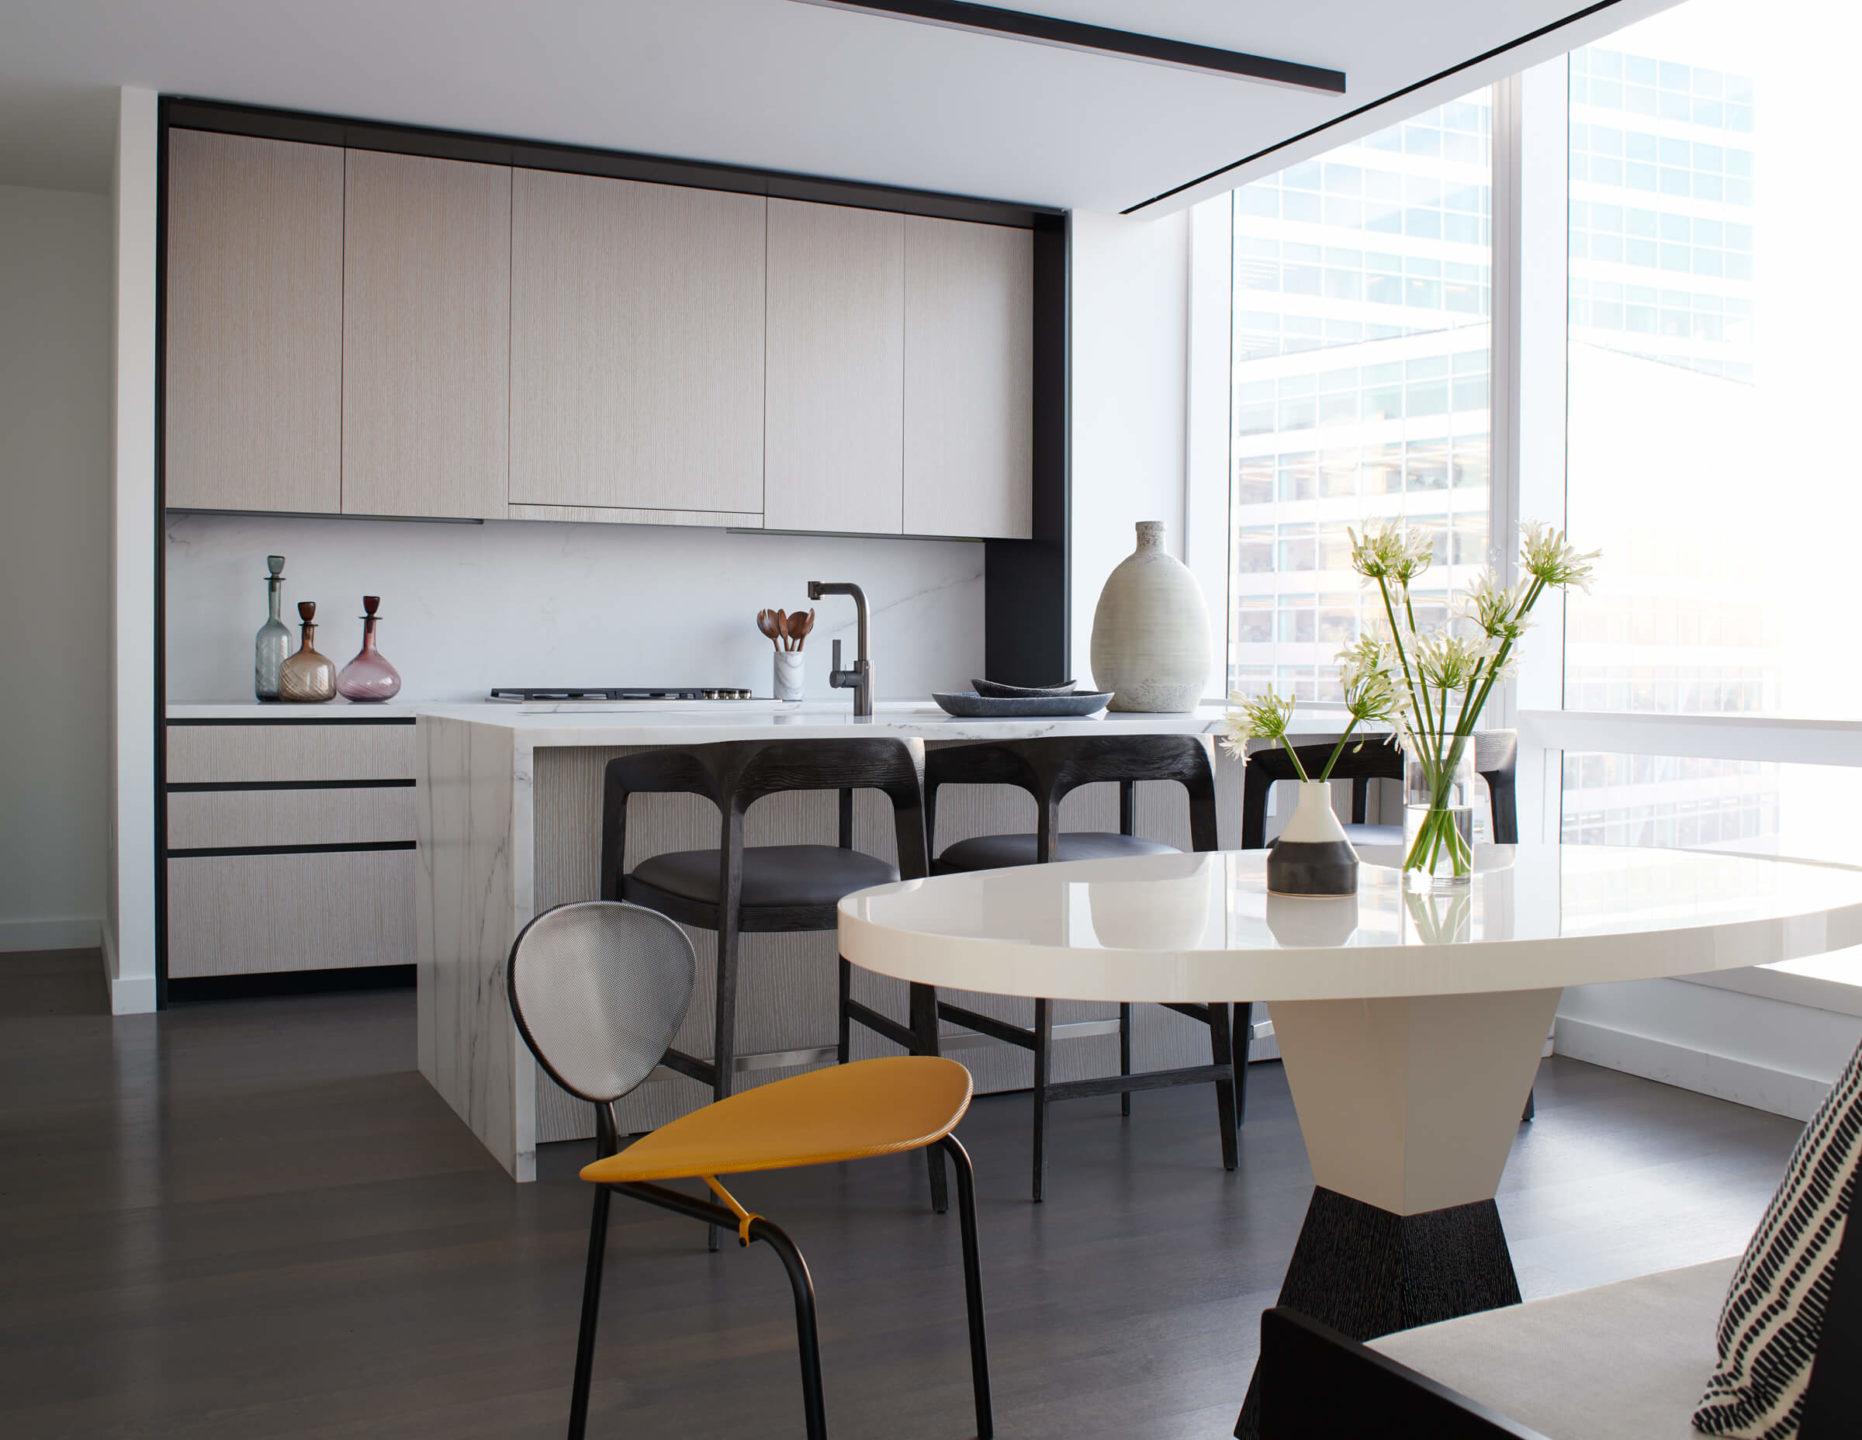 Nicole-fuller-luxury-interior-design-nyc-111Murray_S17_260